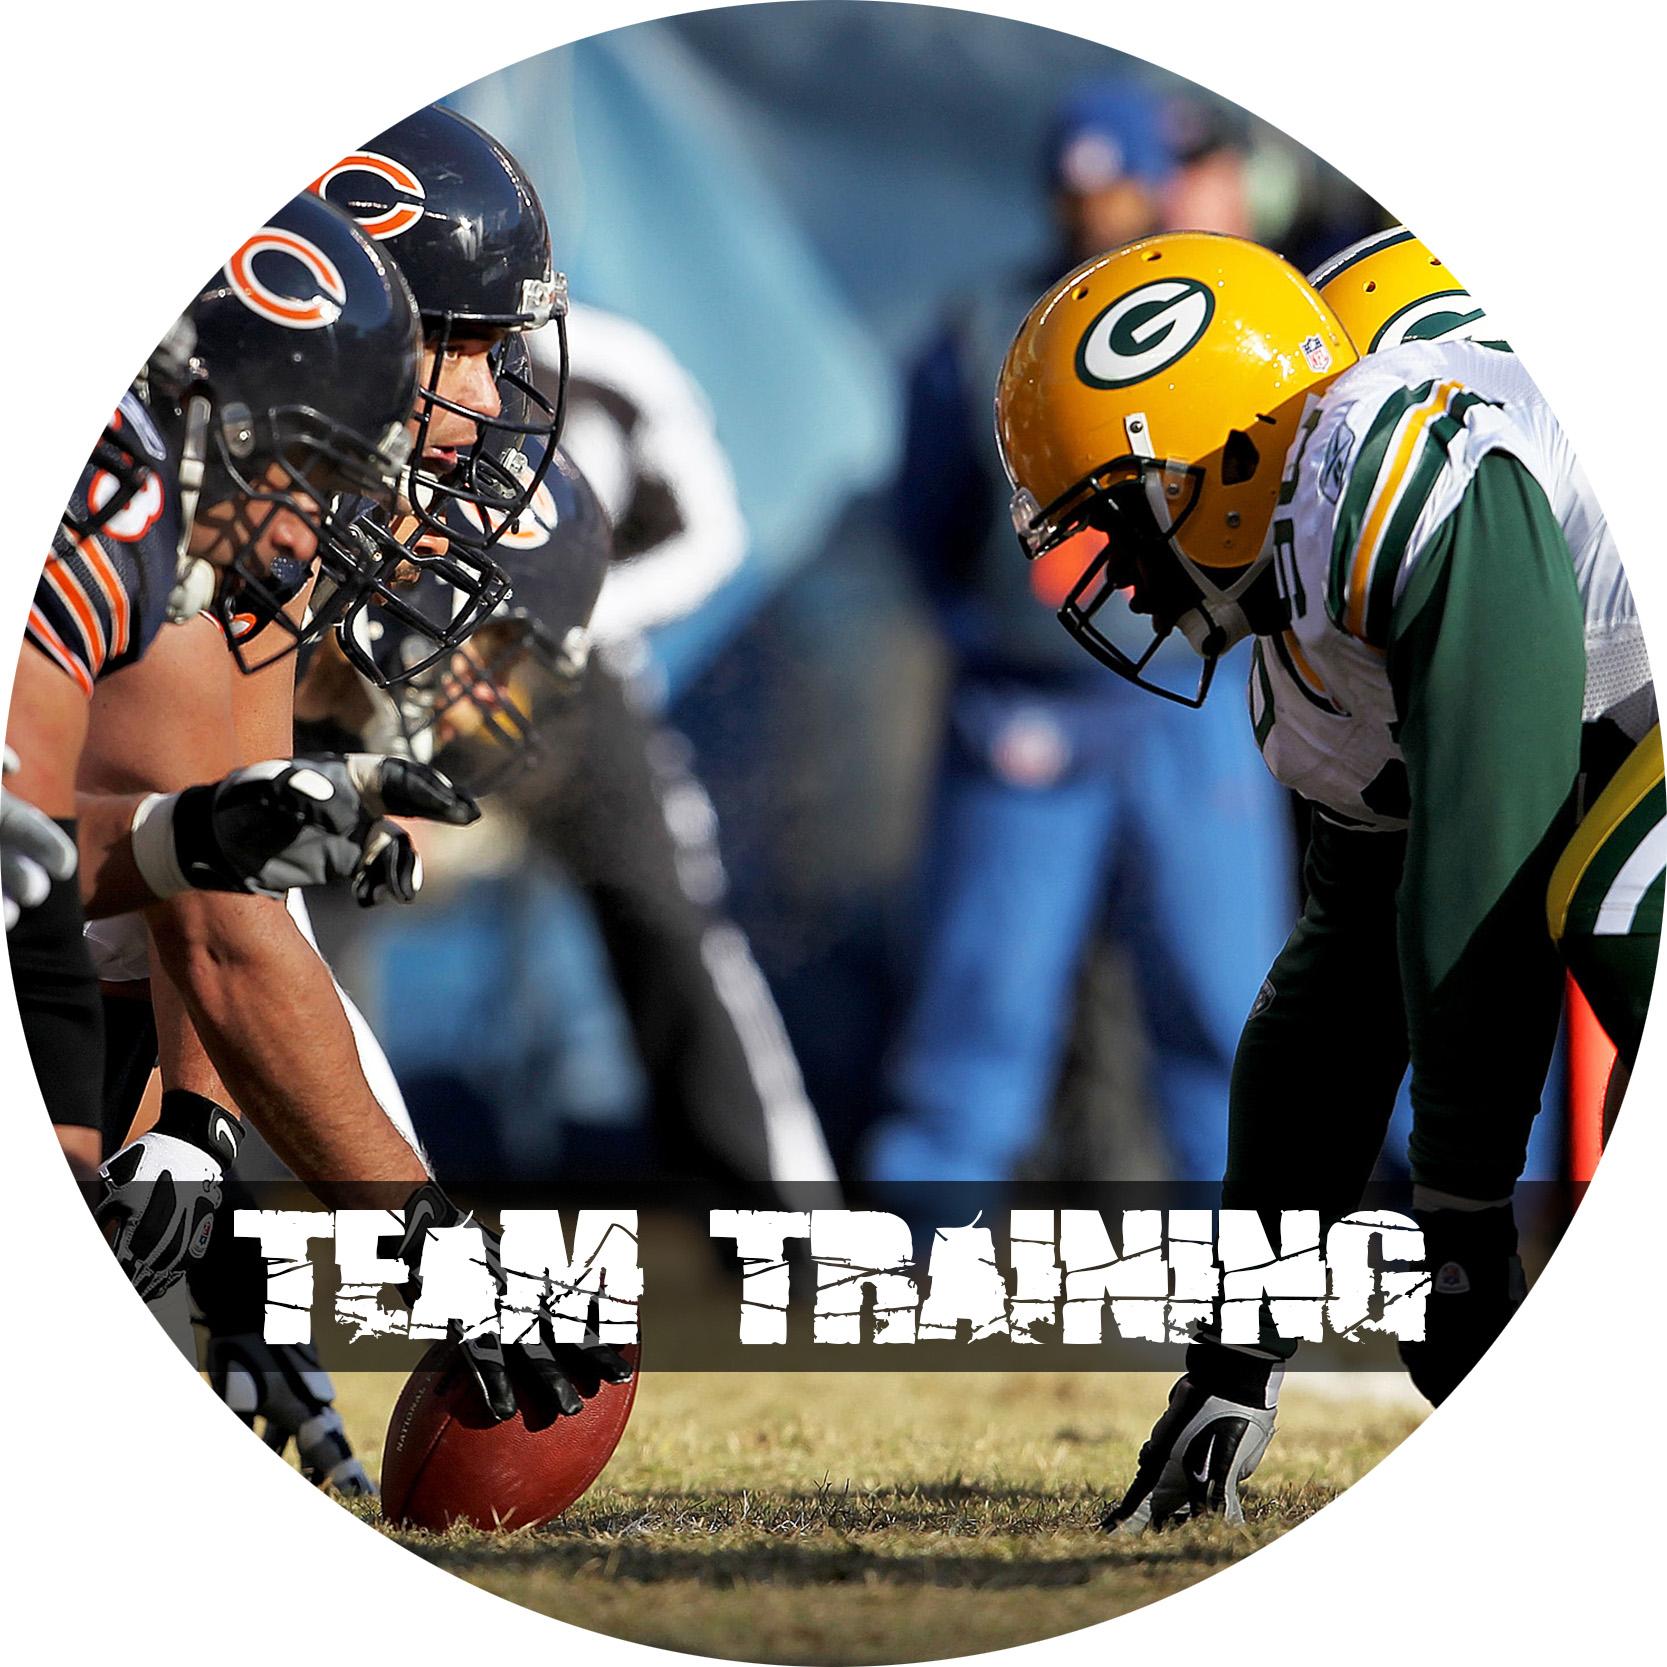 Team Training Circle (AHP).jpg